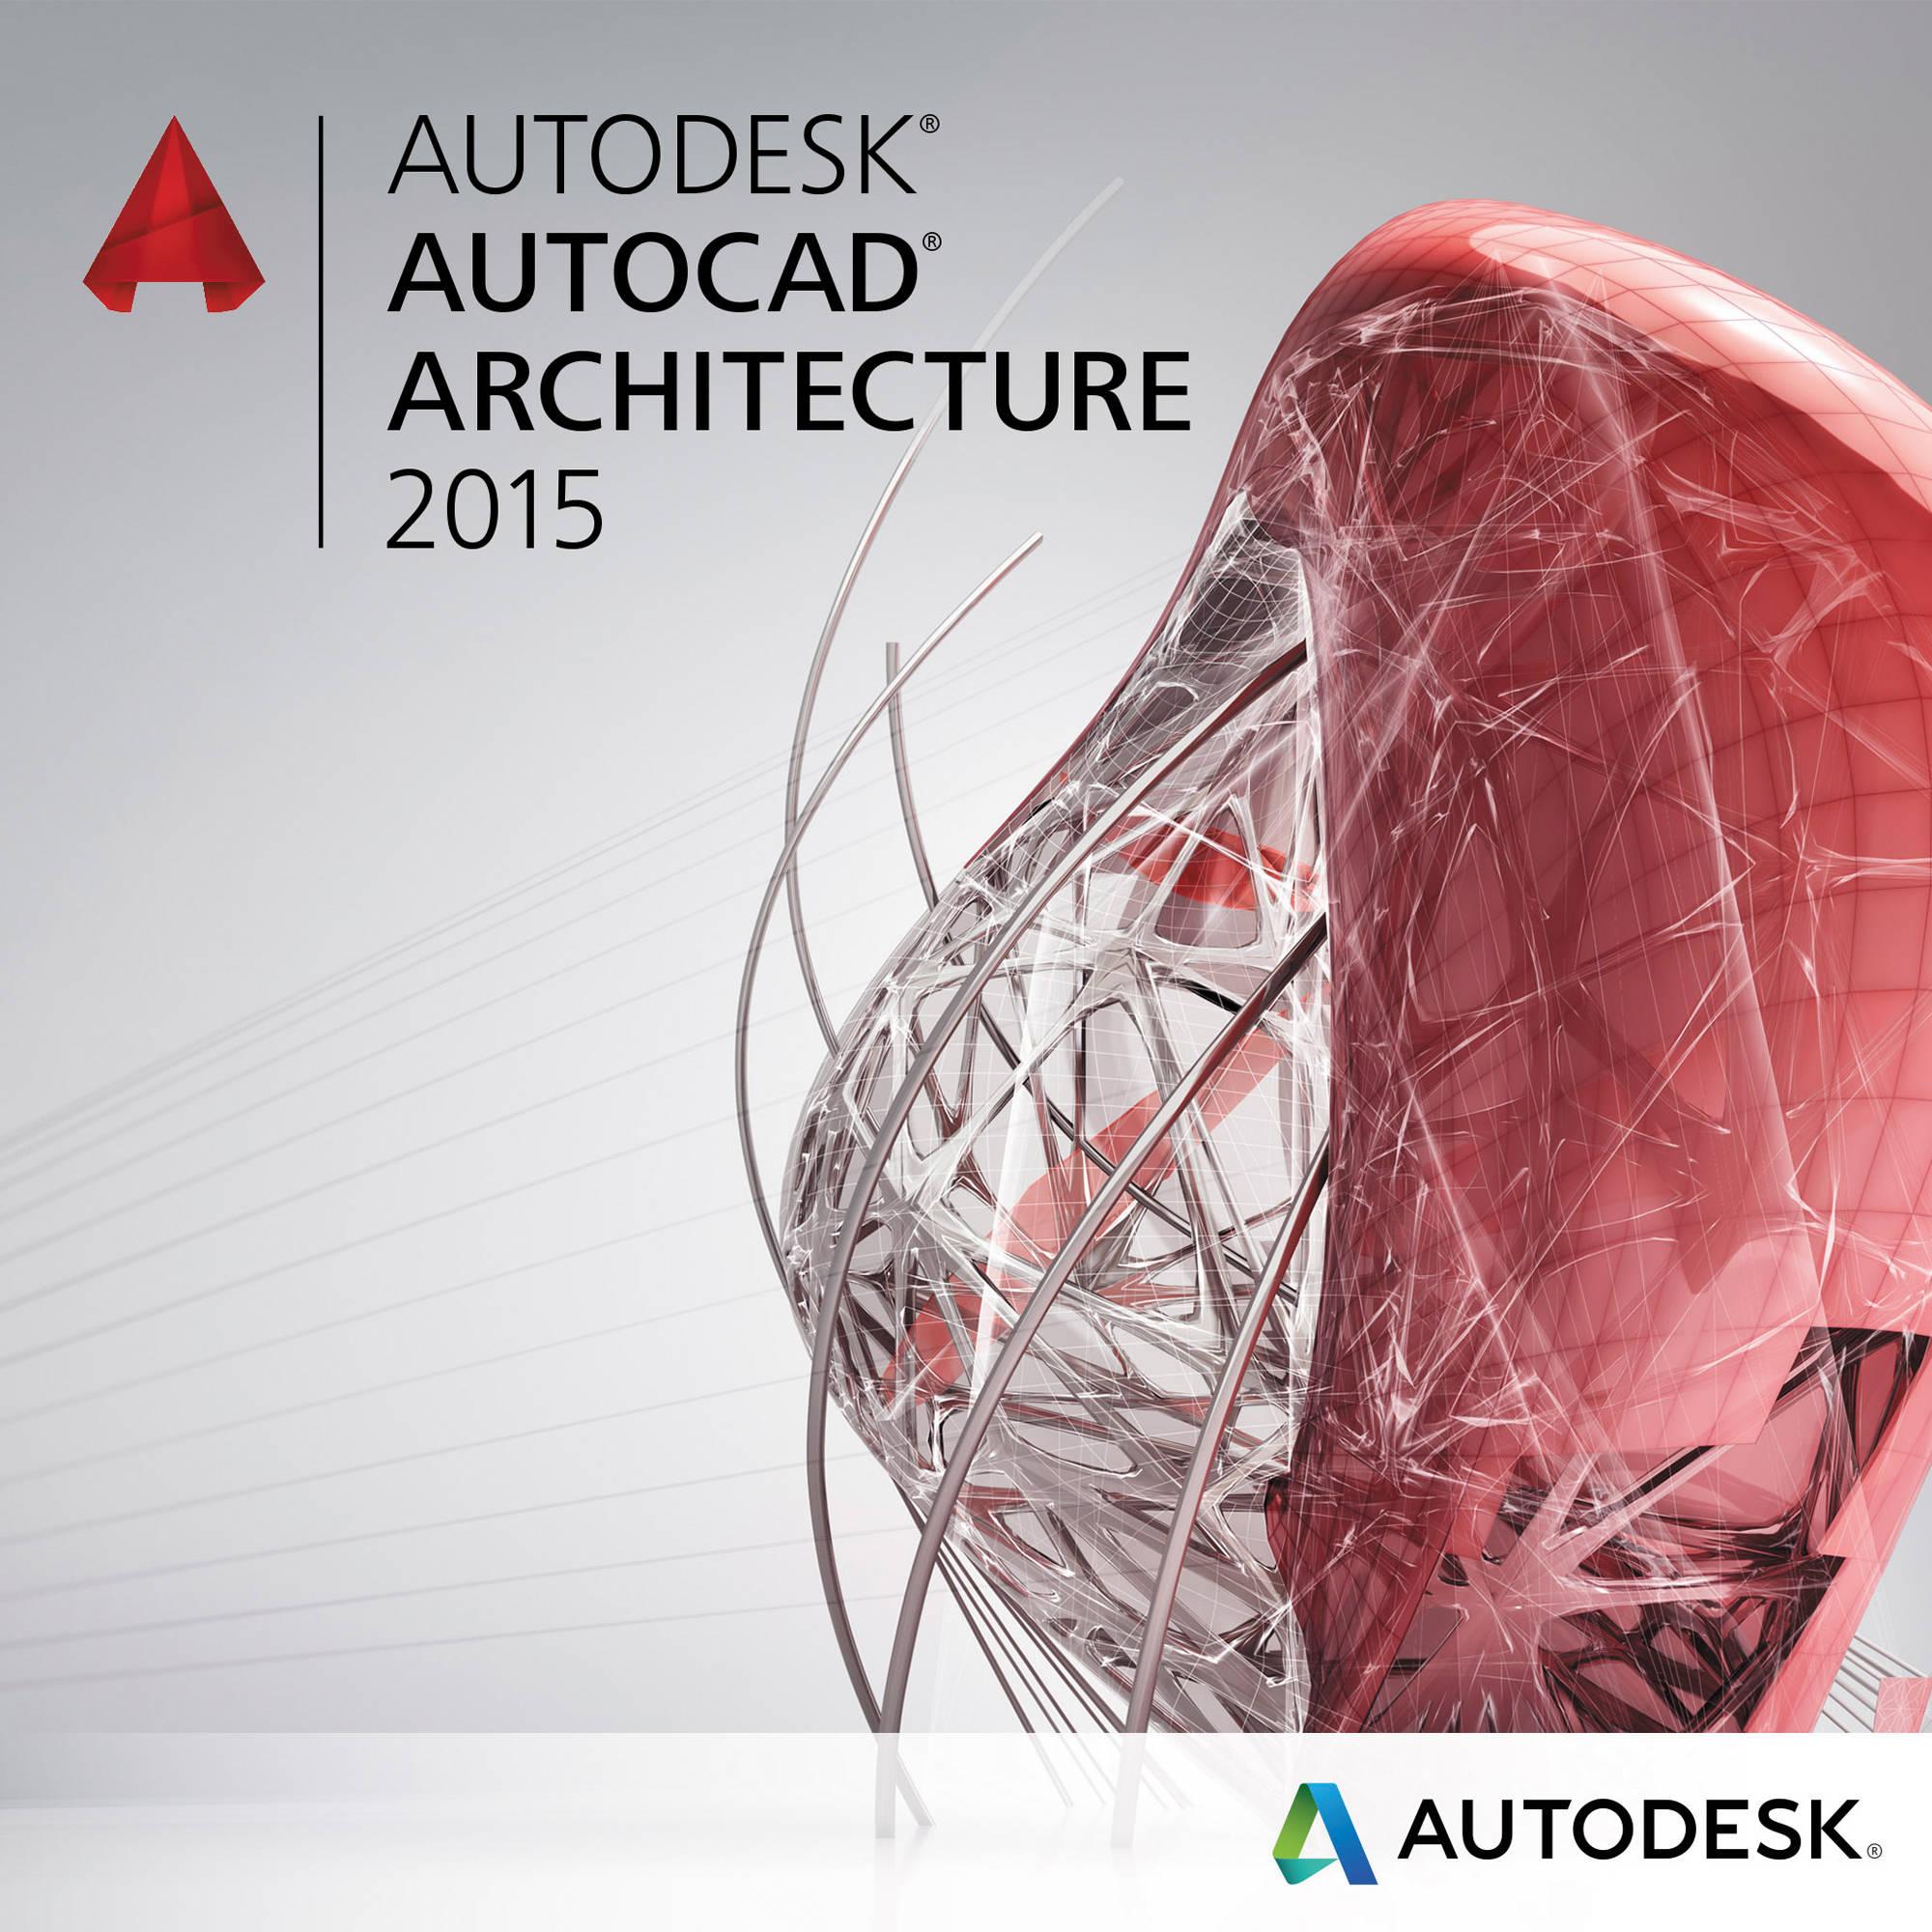 Autocad Architecture 2015 Discount